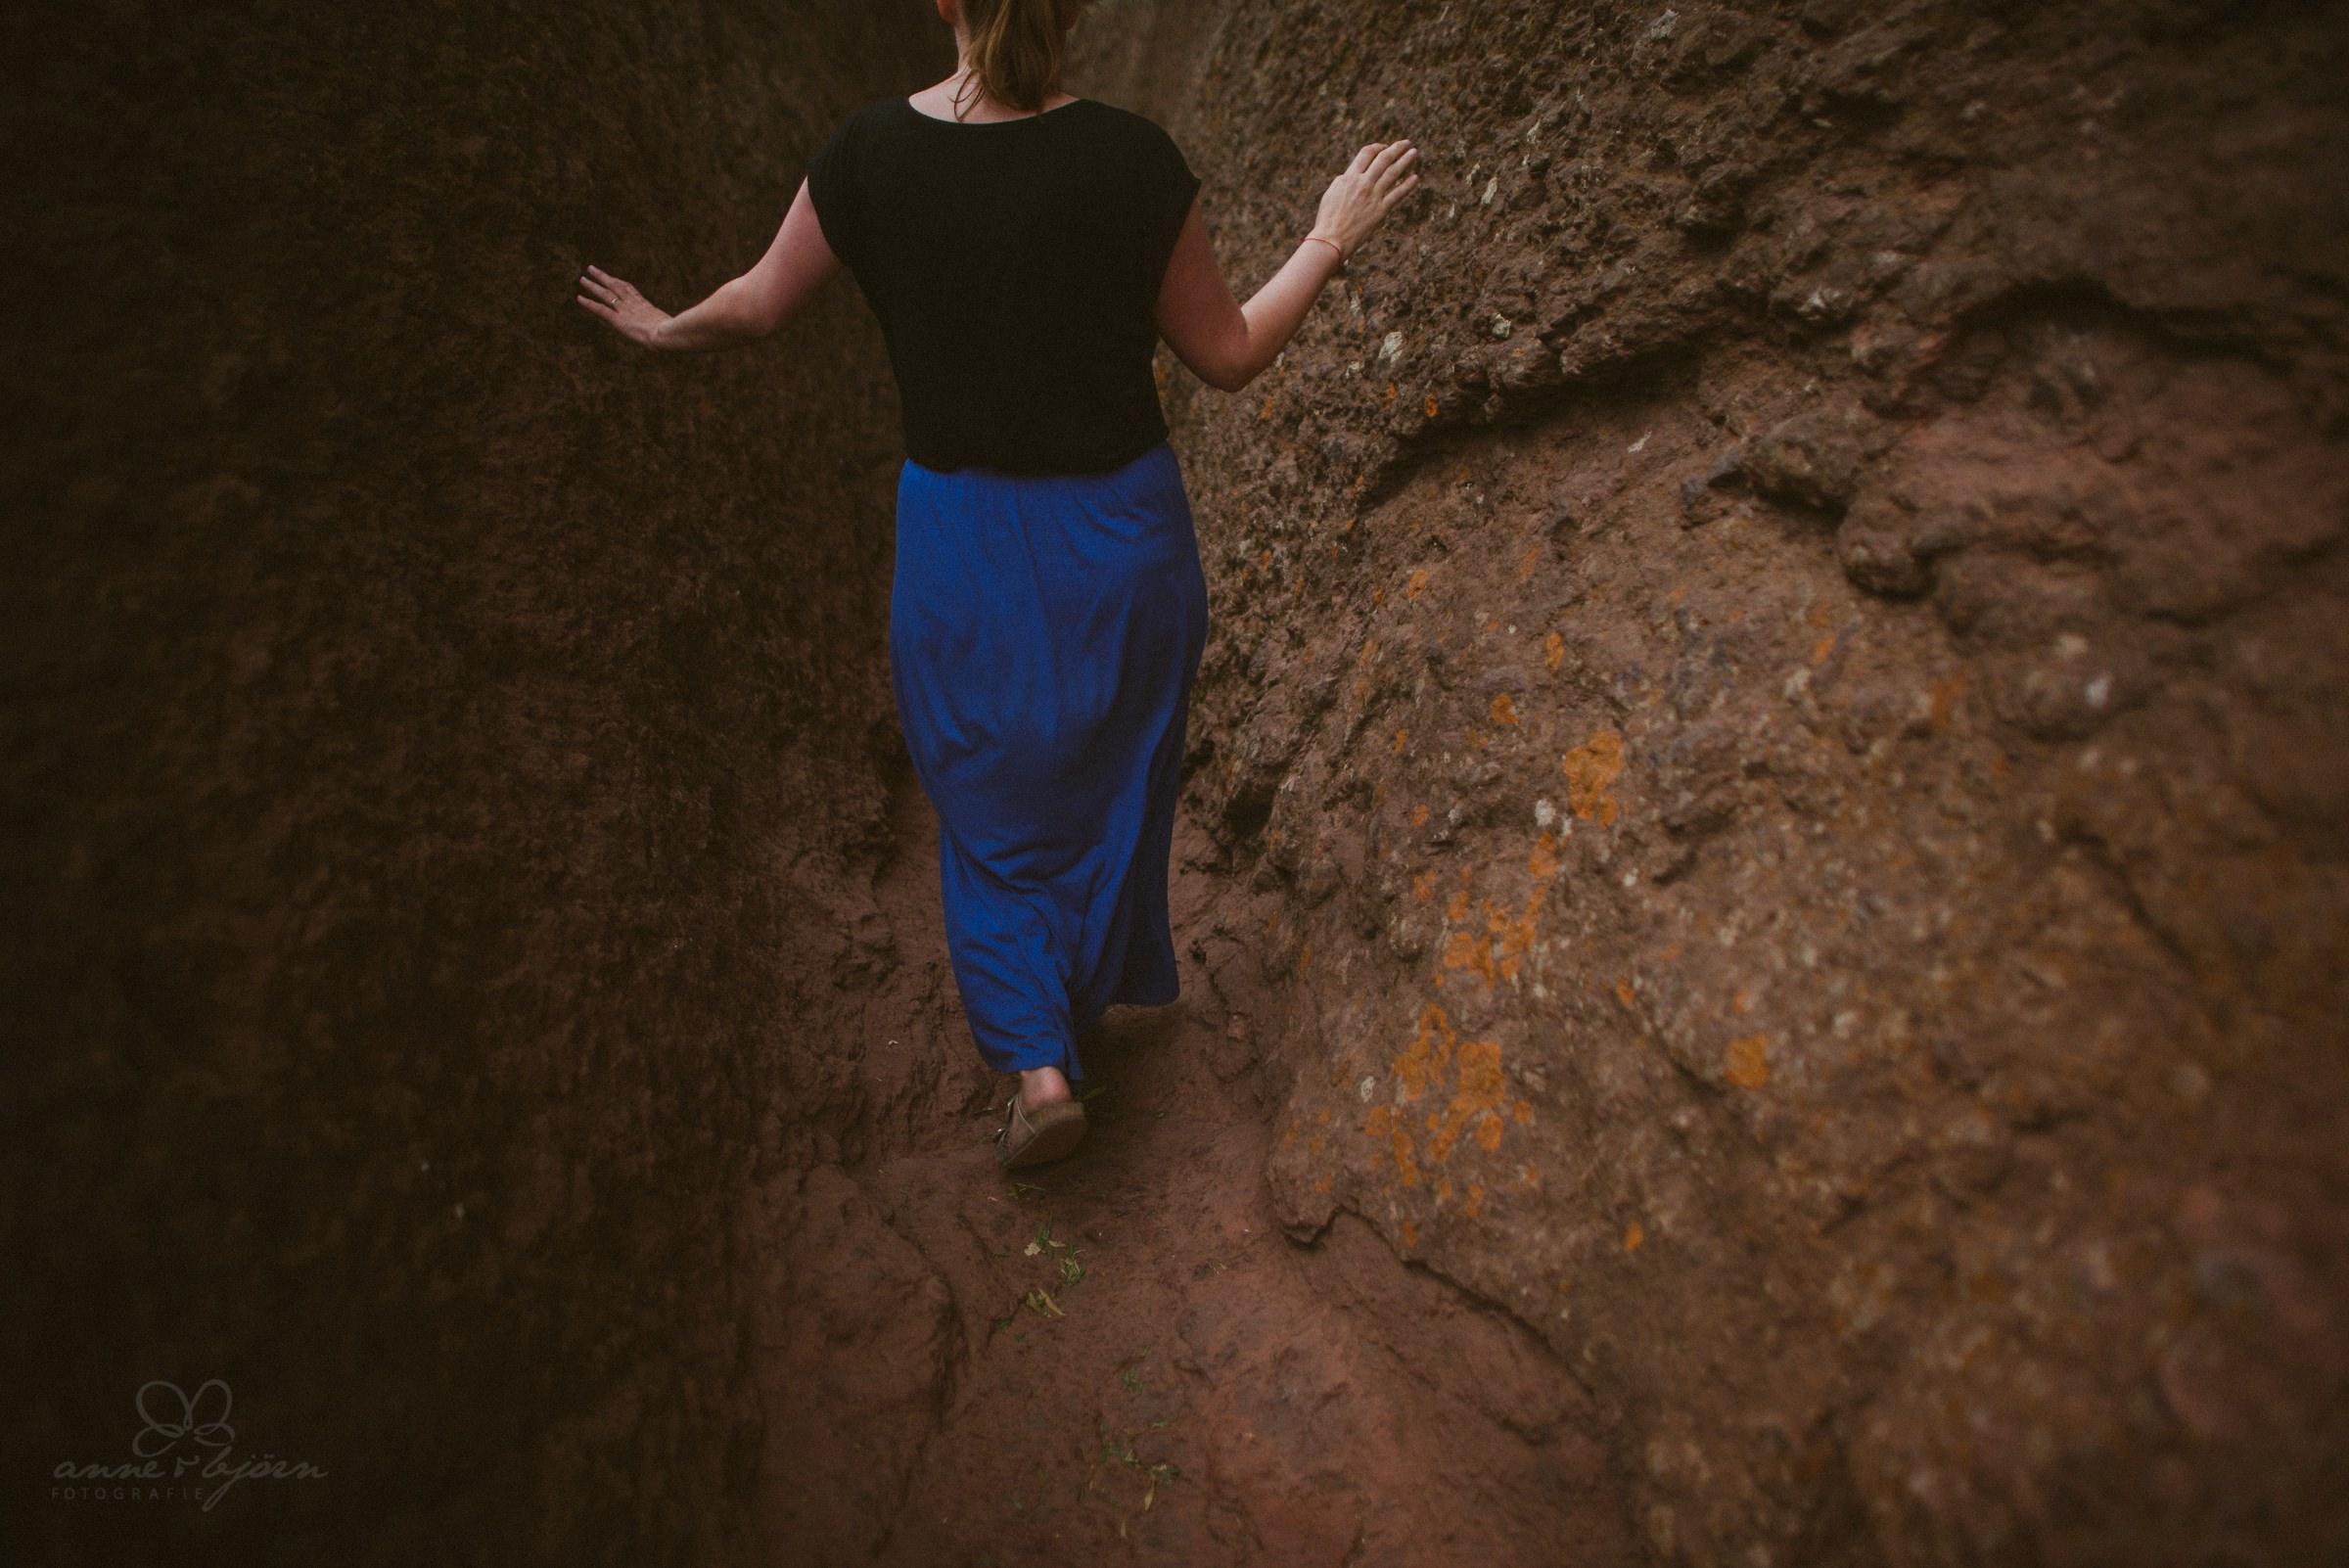 Spaziergang, Mood, Stimmung, blauer Rock, H&M